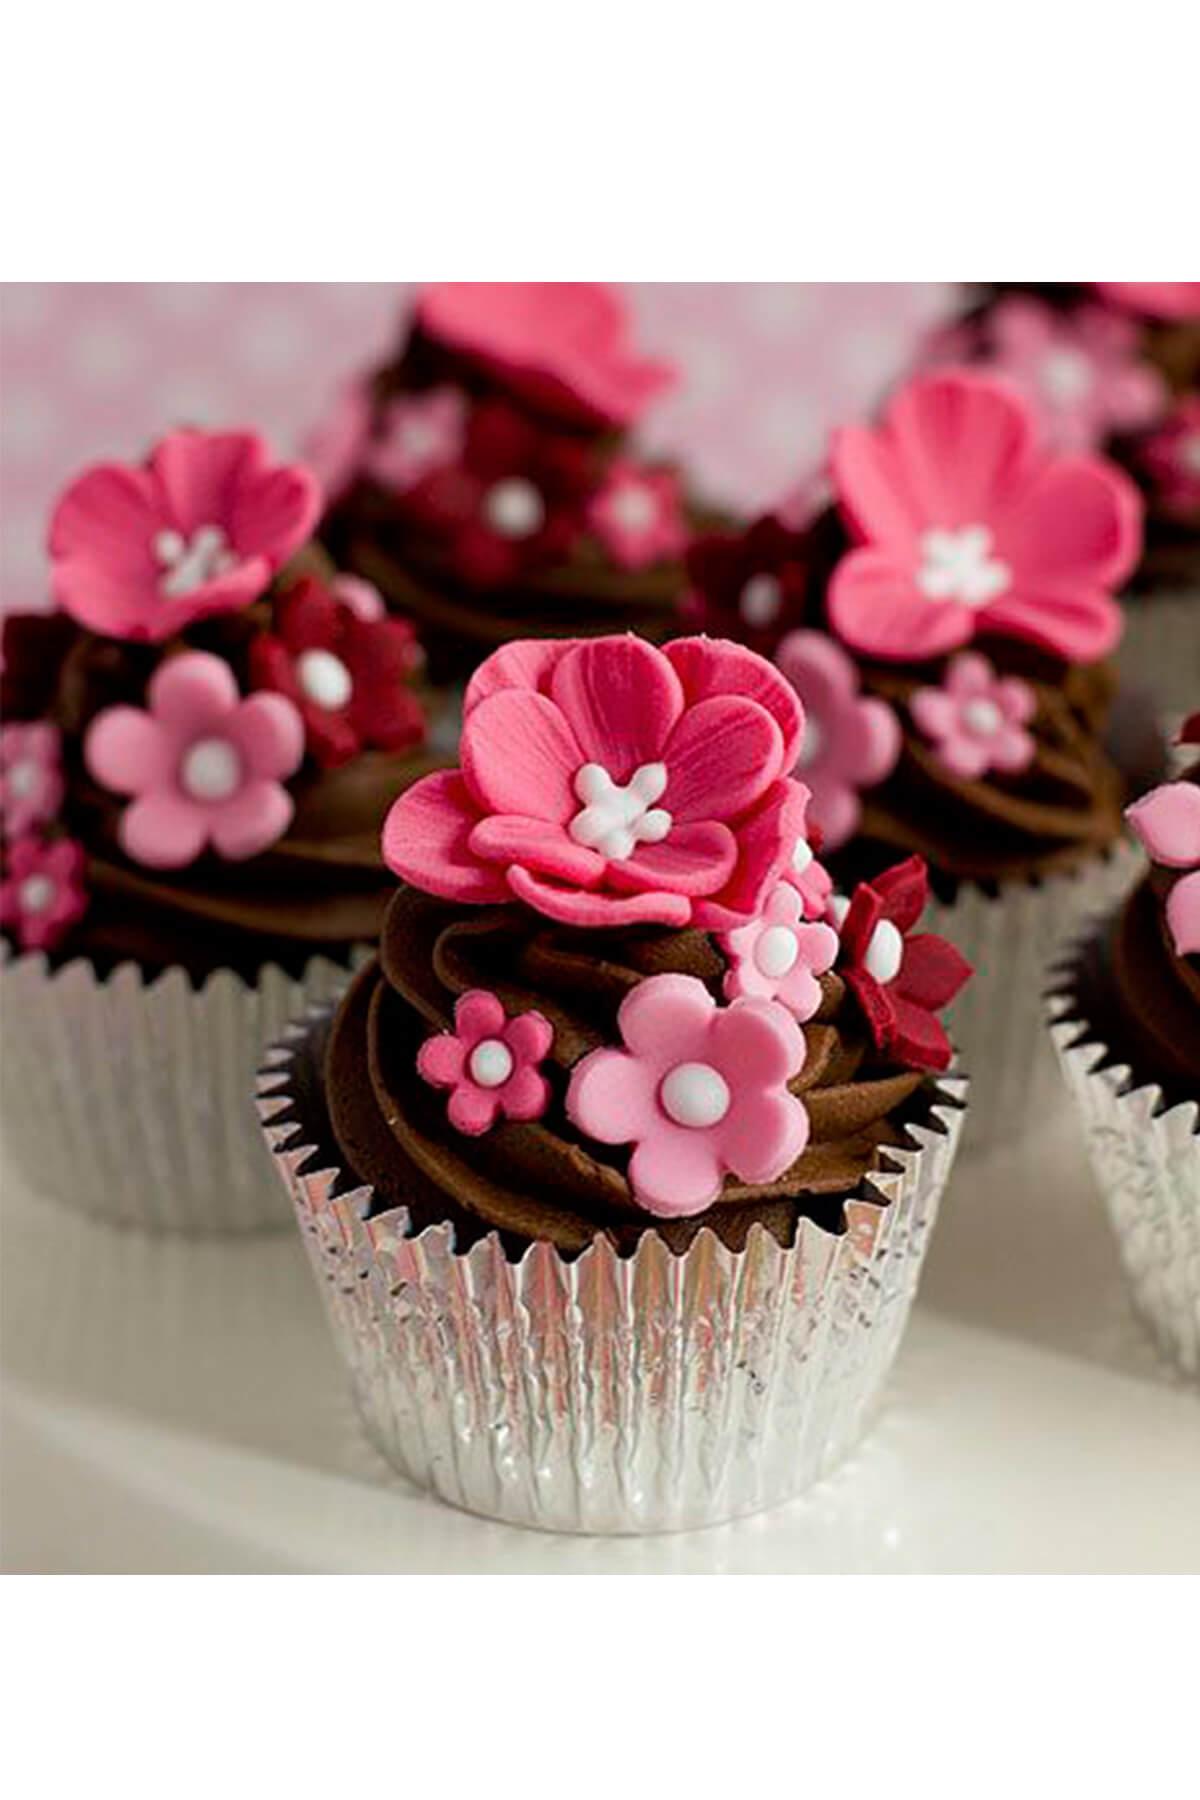 Cupcake socola xoắn kem có trang trí hoa fondant xinh đẹp